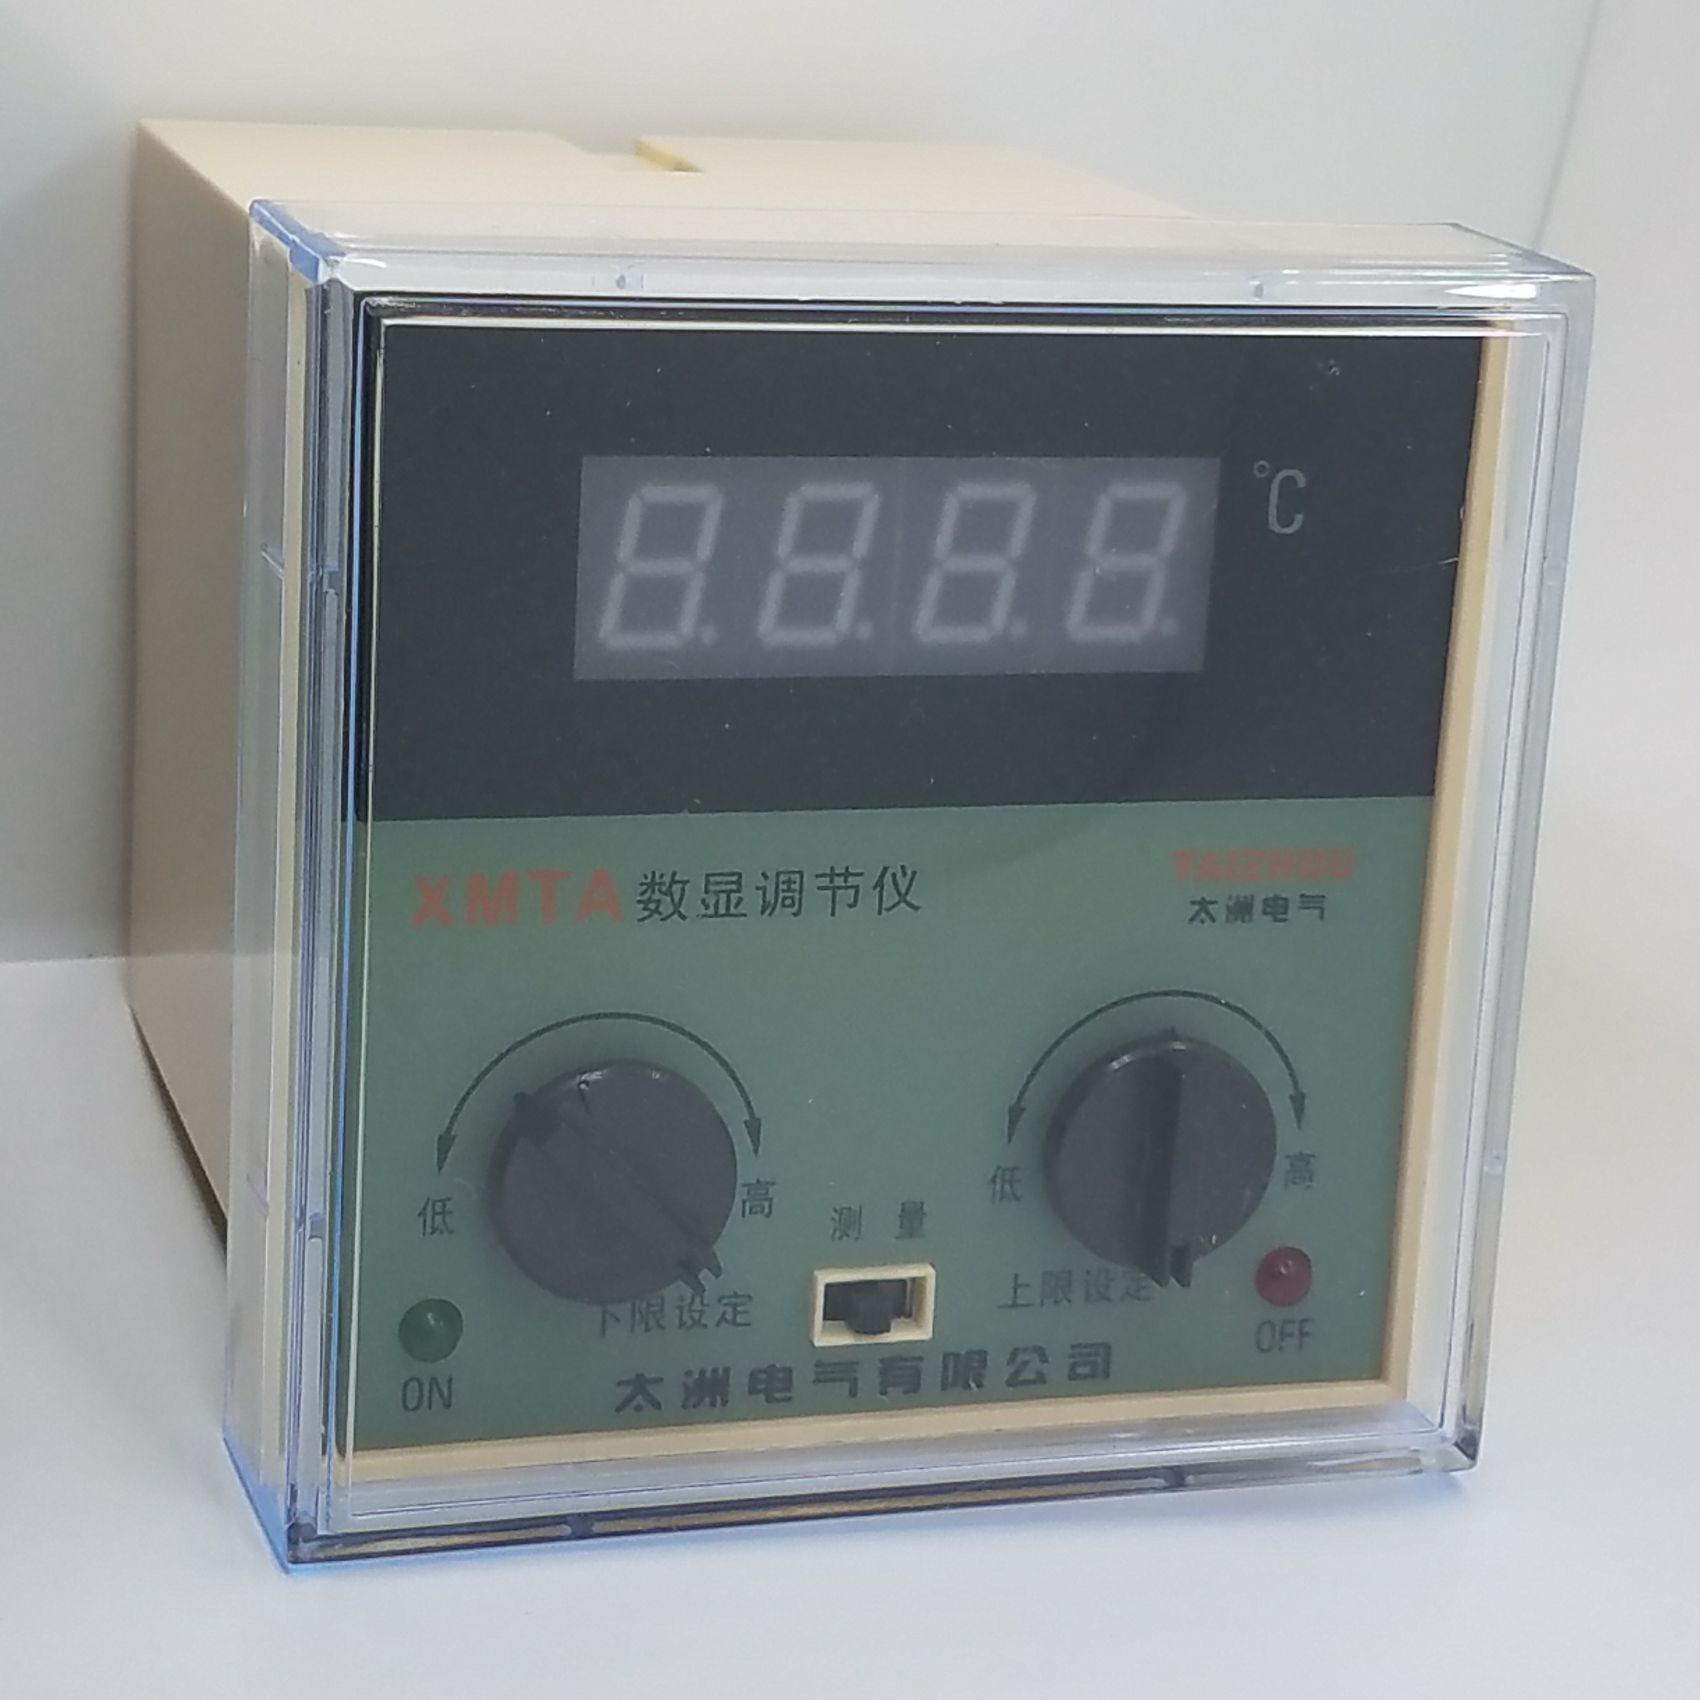 TAIZHOU Electrical Appliance Meter Digital Electronic Temperature Controller relay XMTA-2301 K TYPE 0-400 XMT SeriesOven-5P